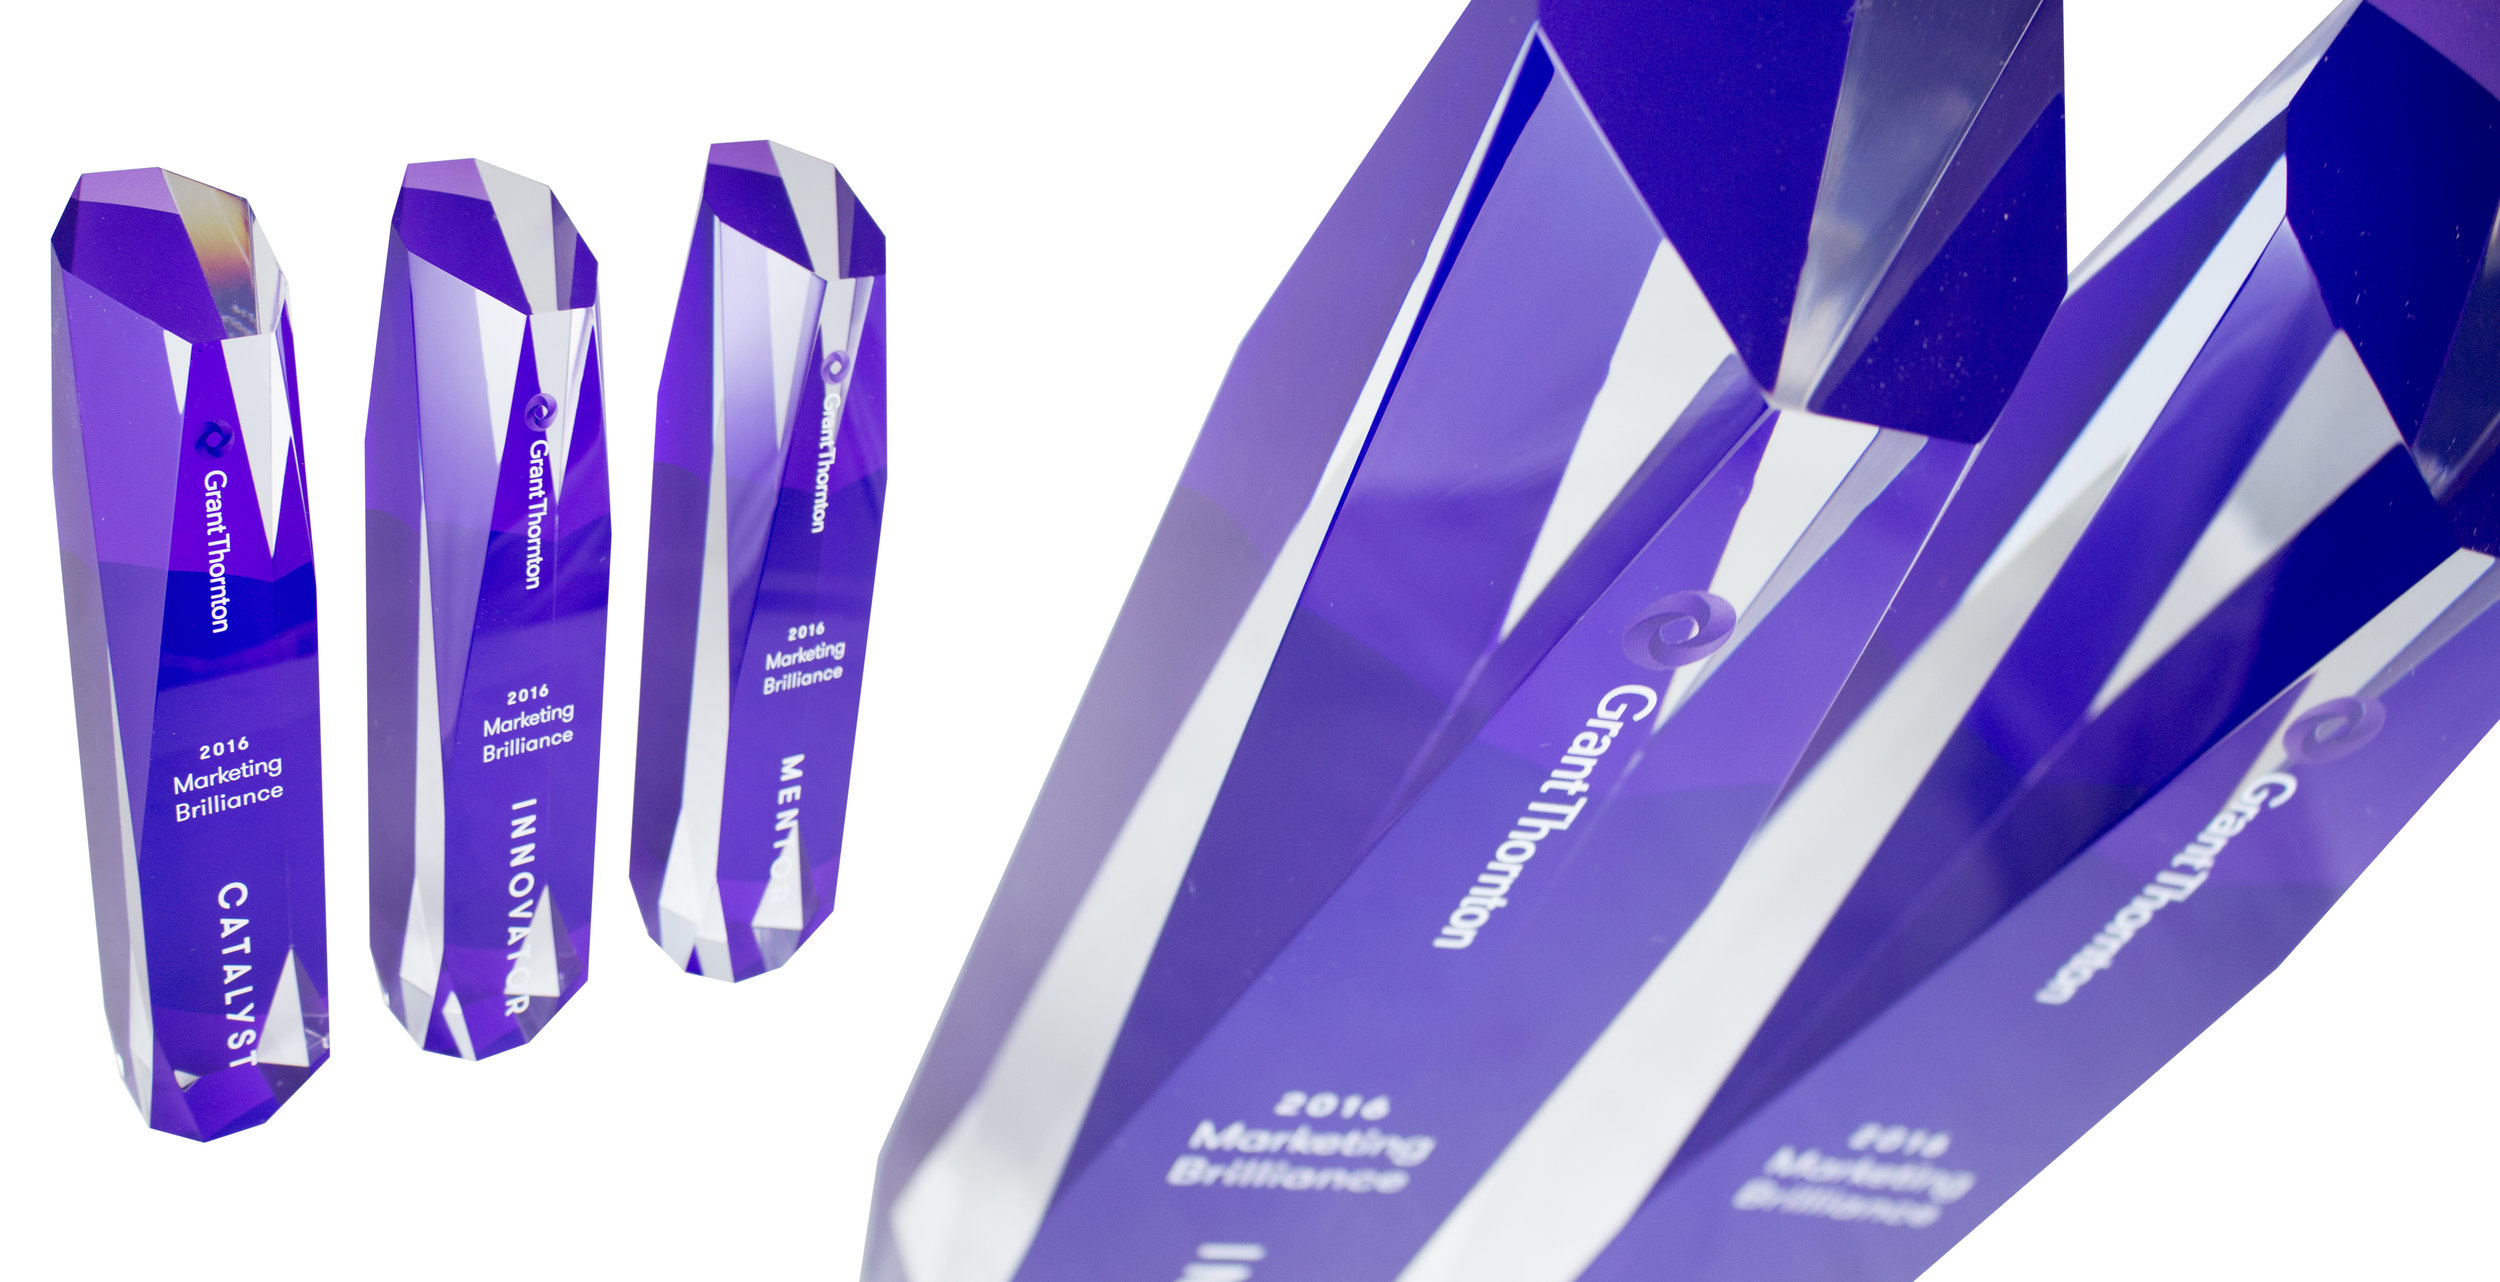 grant thornton custom acrylic award design - modern acrylic custom award